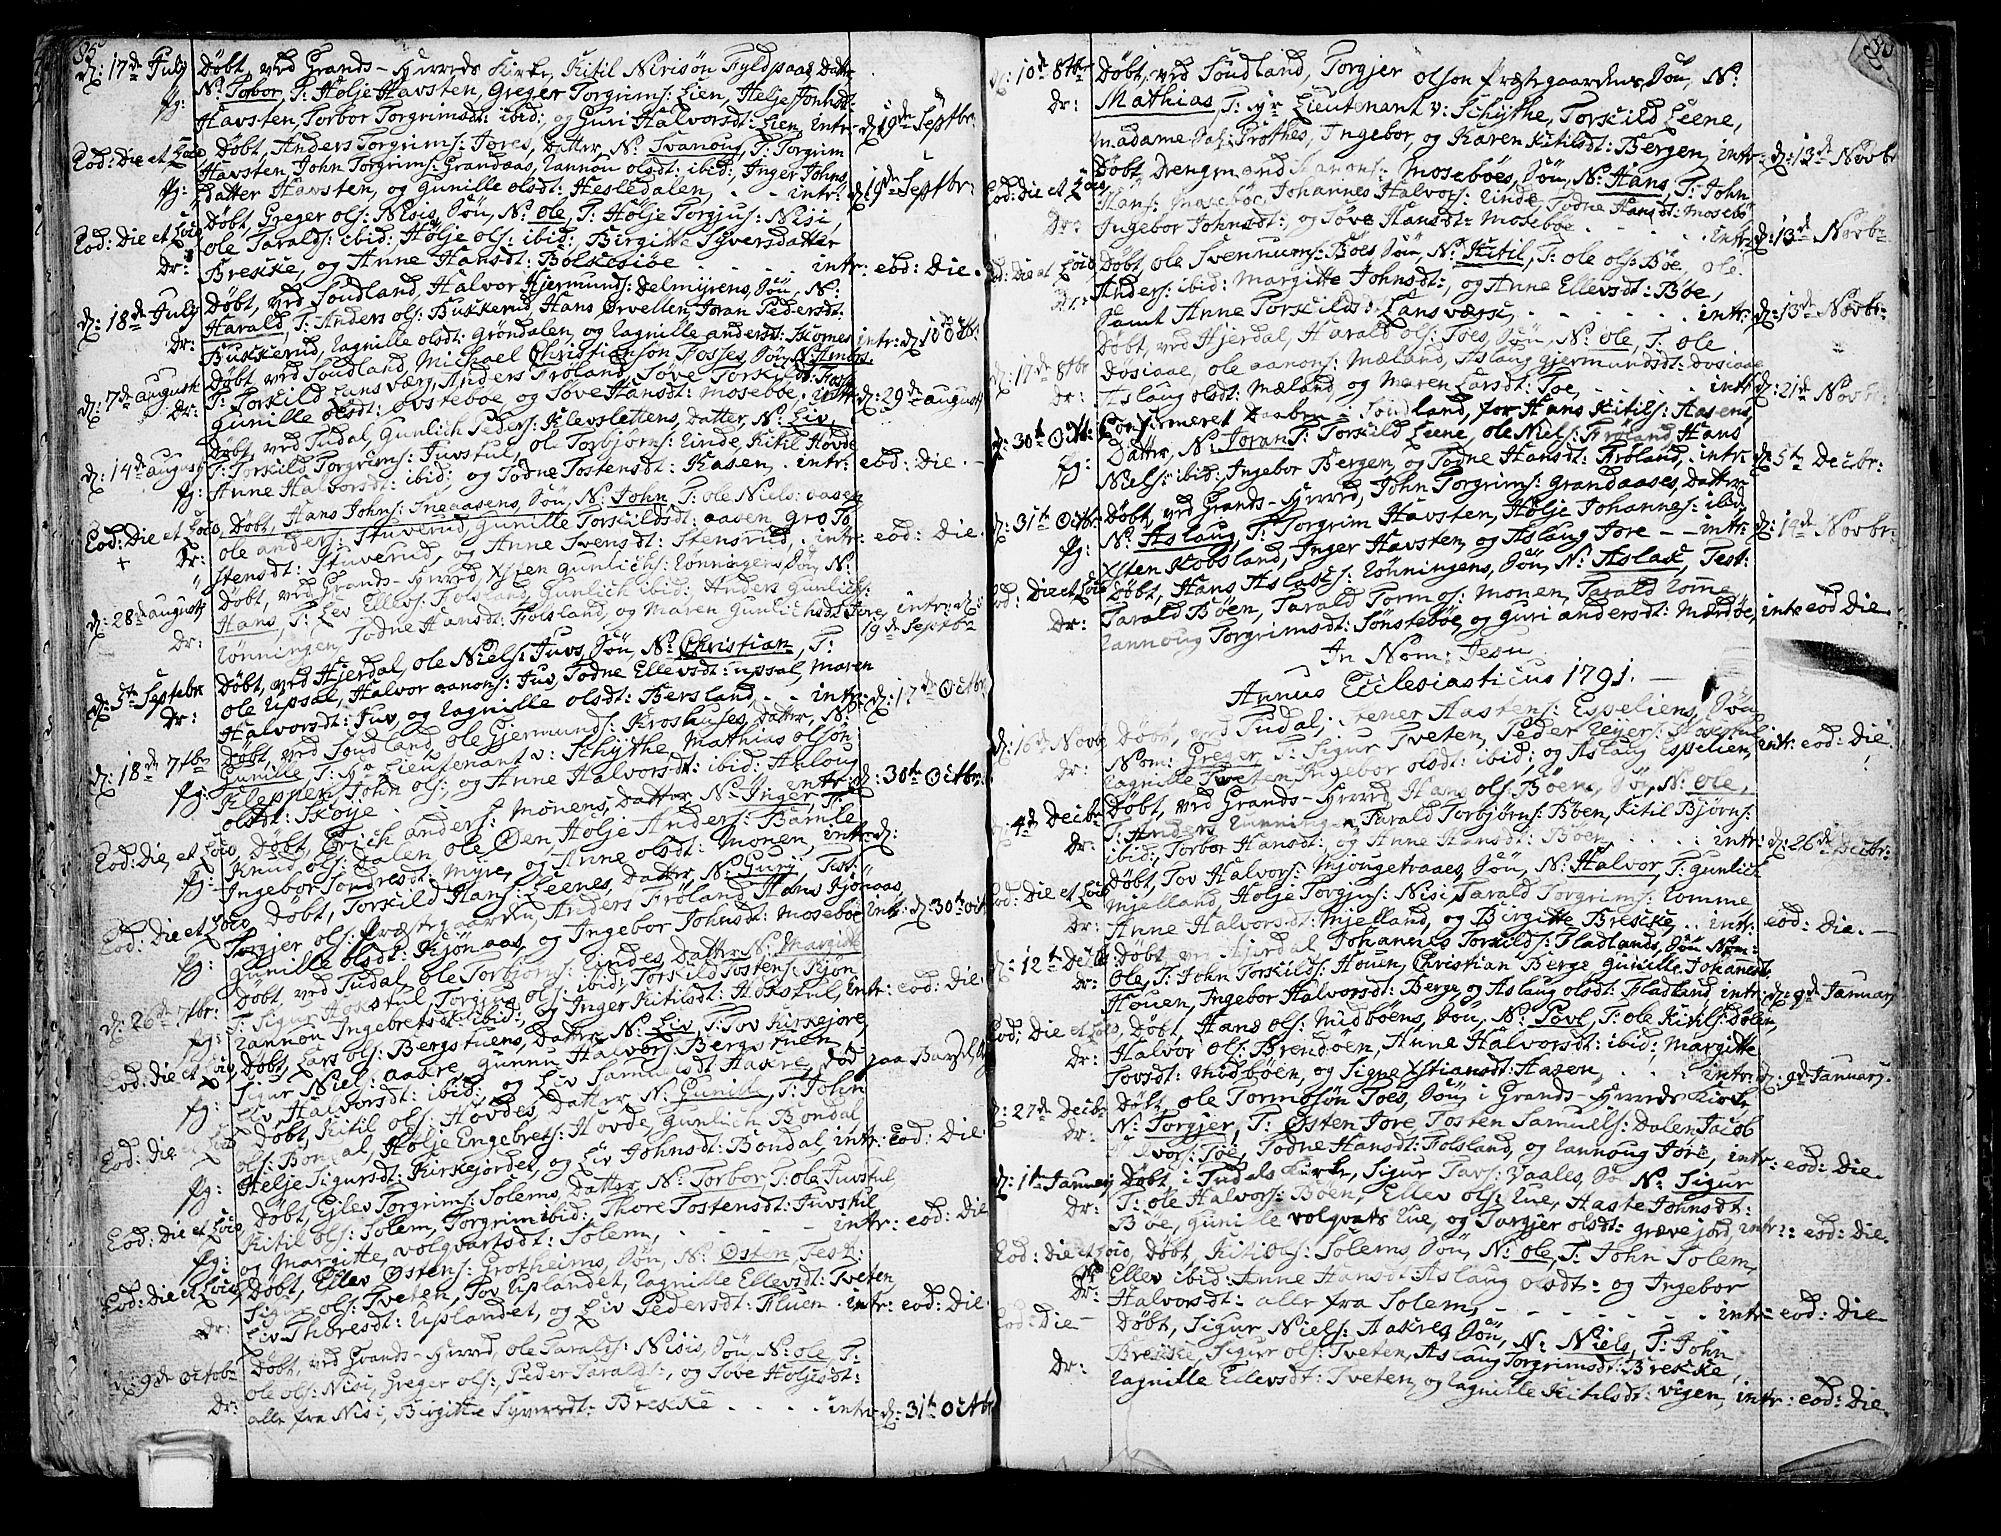 SAKO, Hjartdal kirkebøker, F/Fa/L0005: Ministerialbok nr. I 5, 1776-1801, s. 85-86